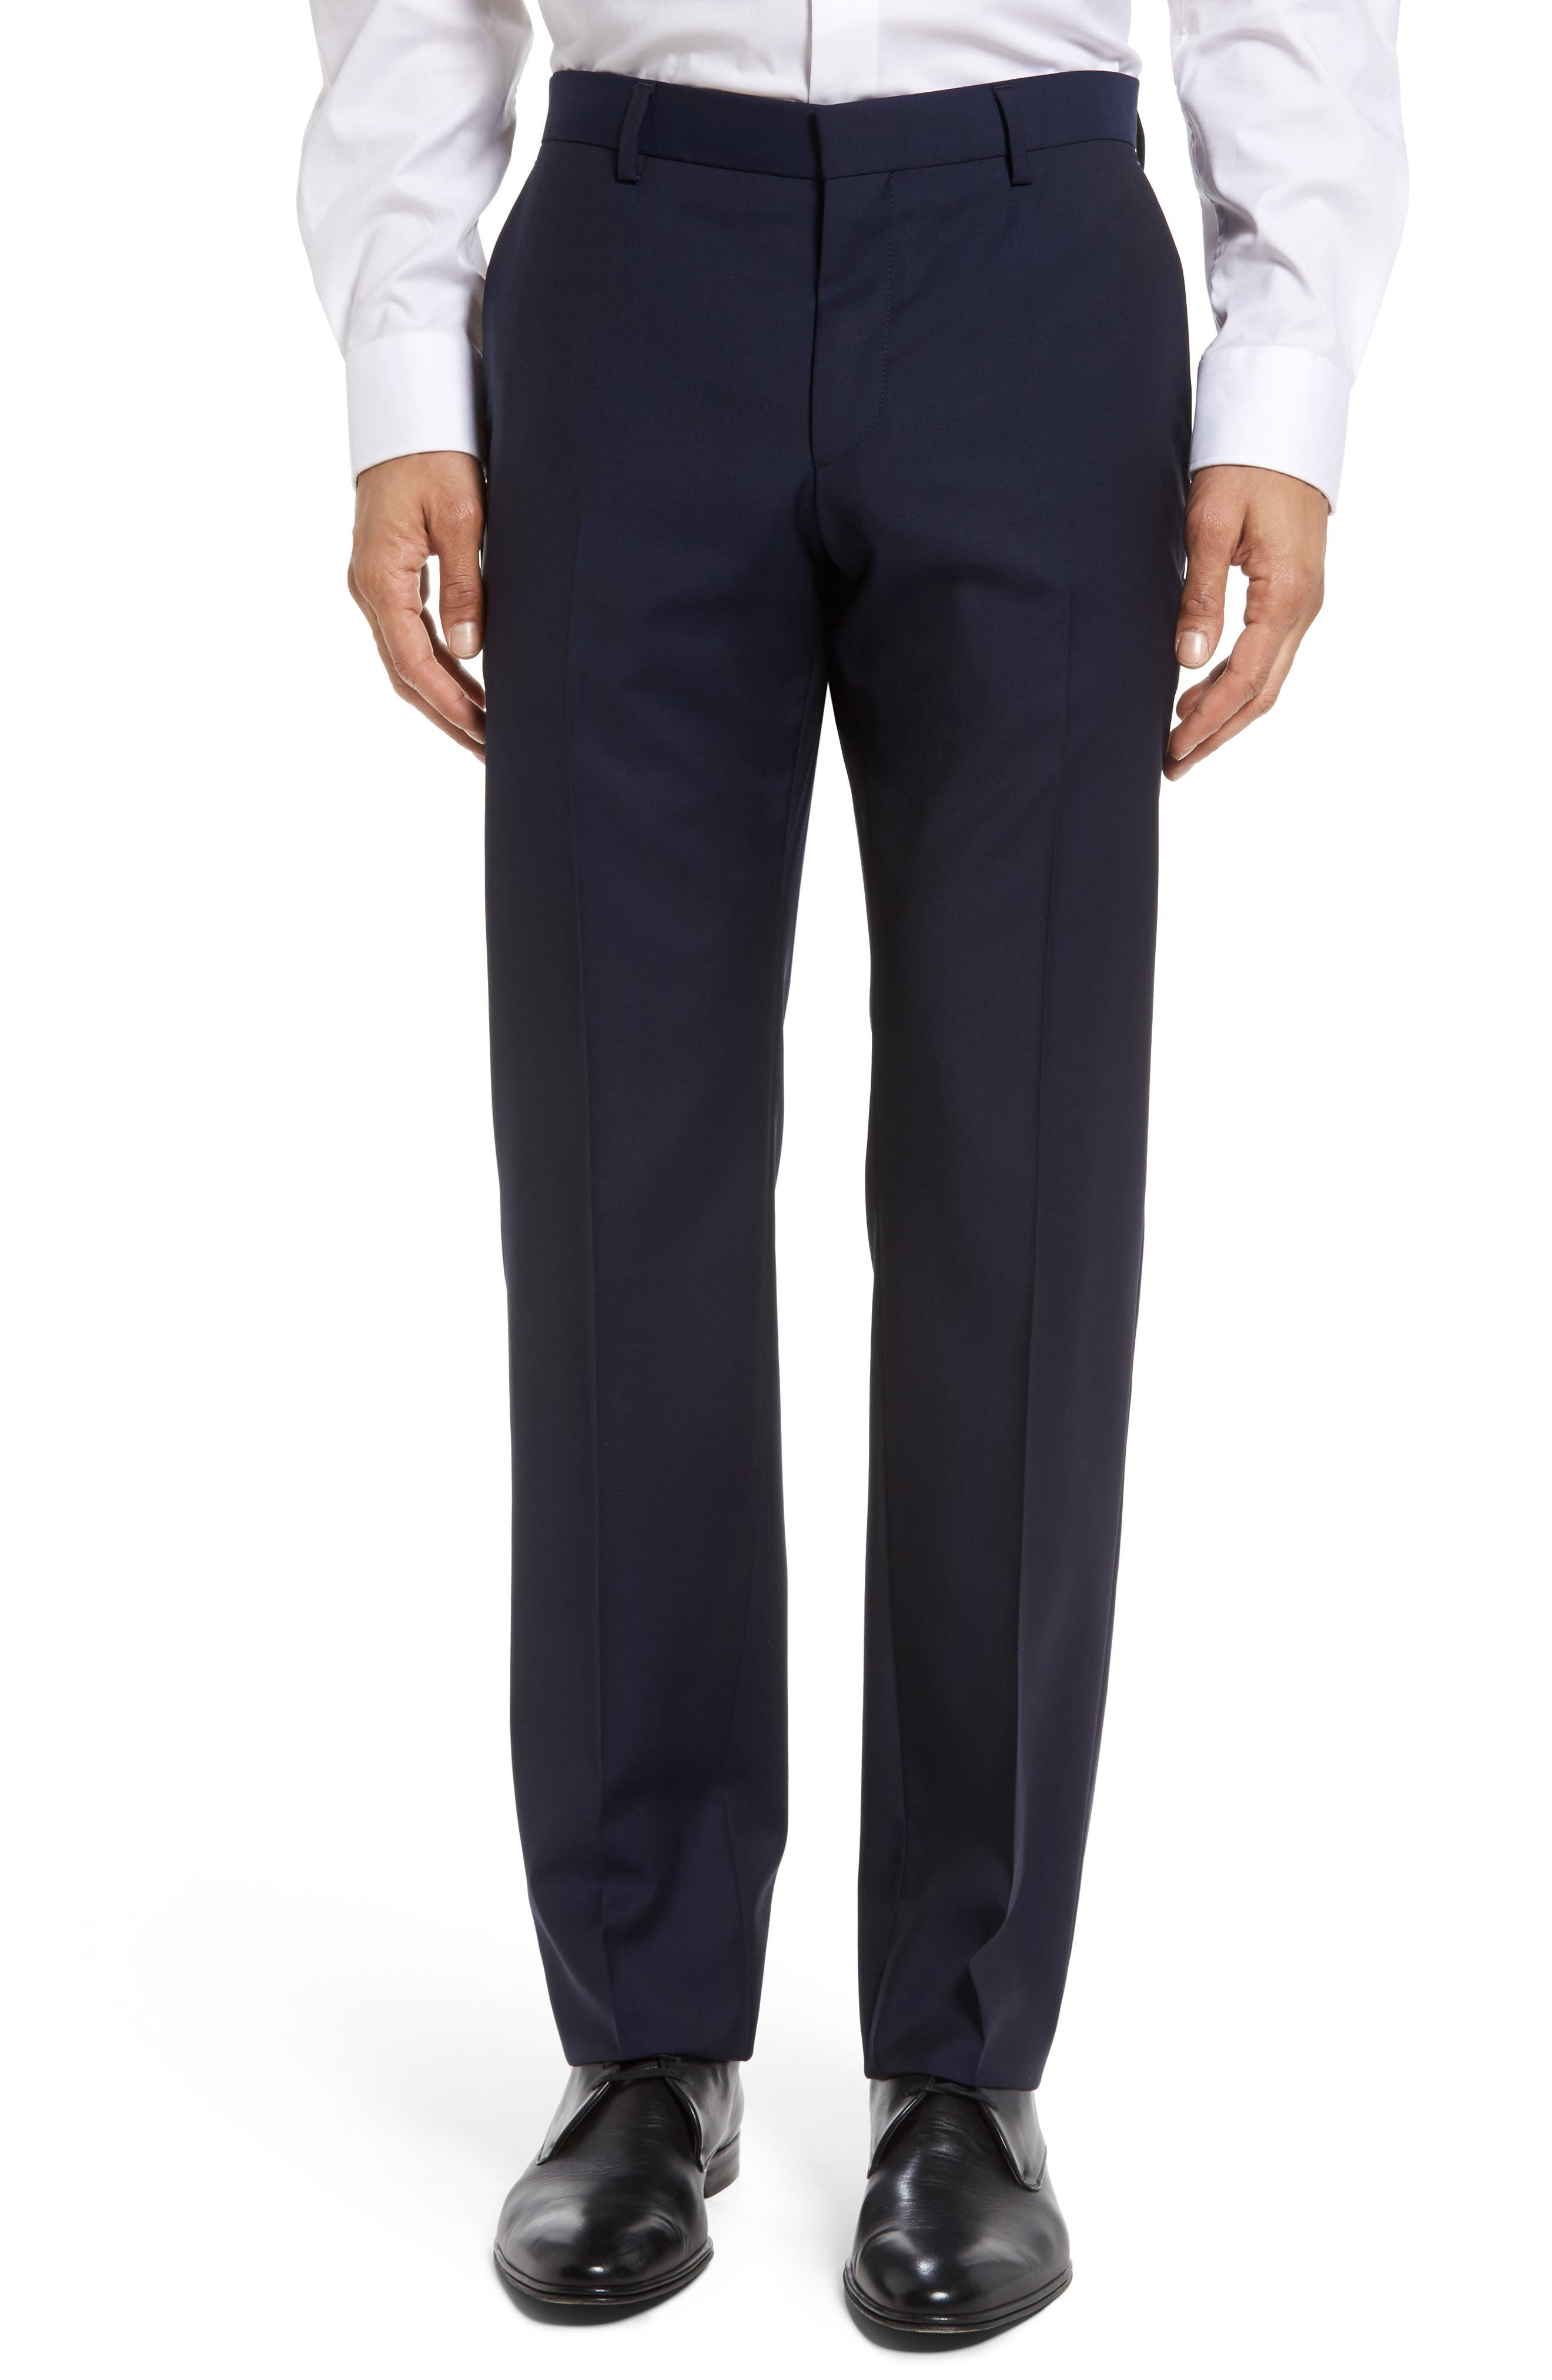 BOSS Genesis Flat Front Trim Fit Solid Wool Trousers